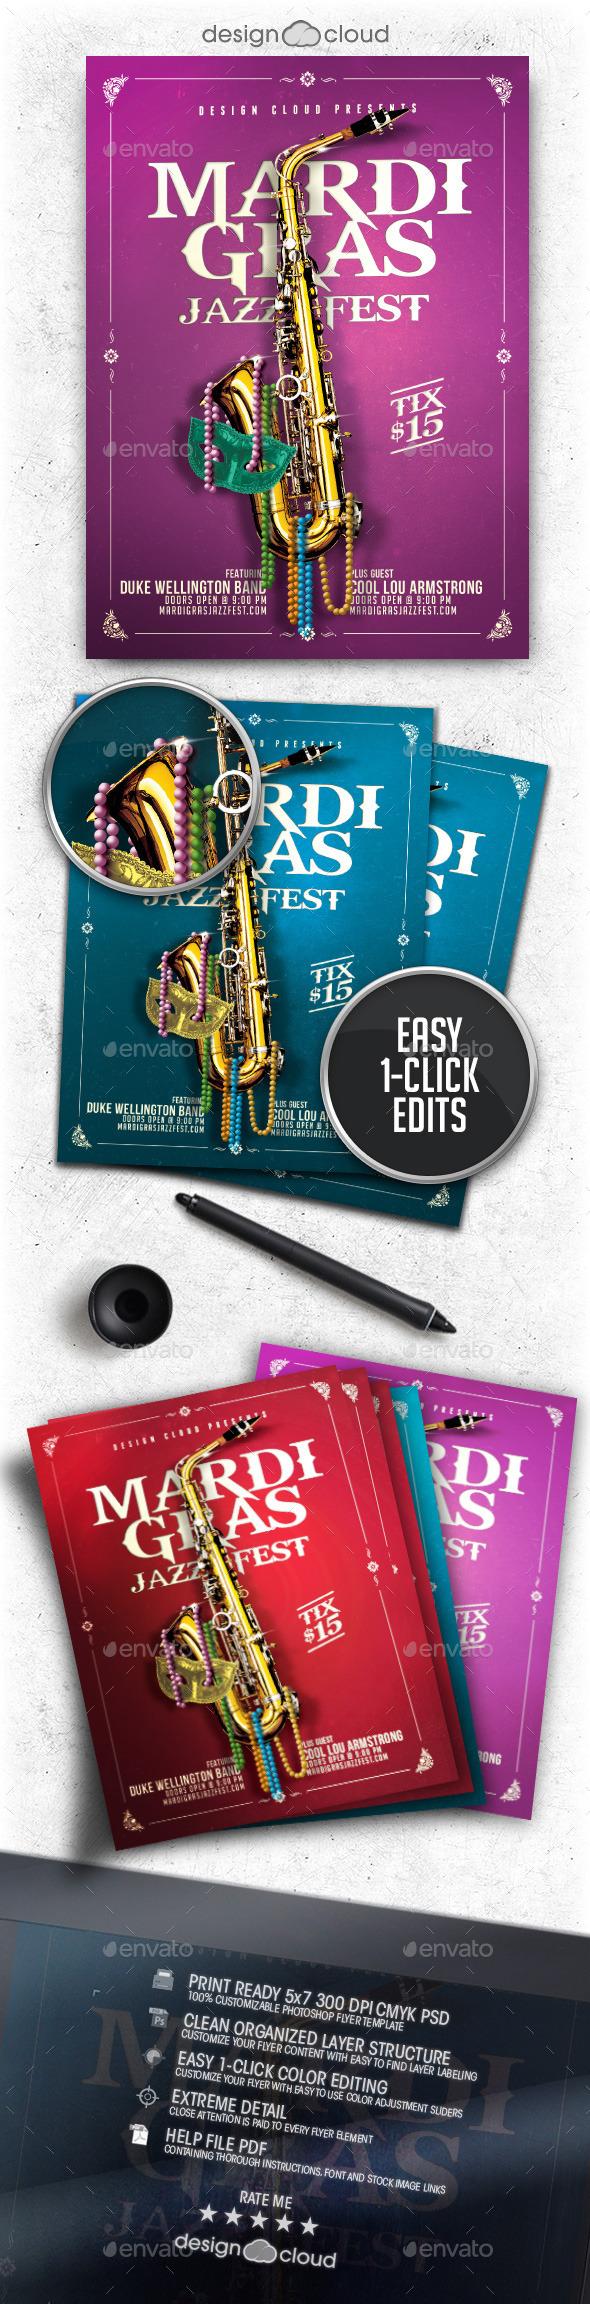 Mardi Gras Jazz Fest Flyer Template - Holidays Events